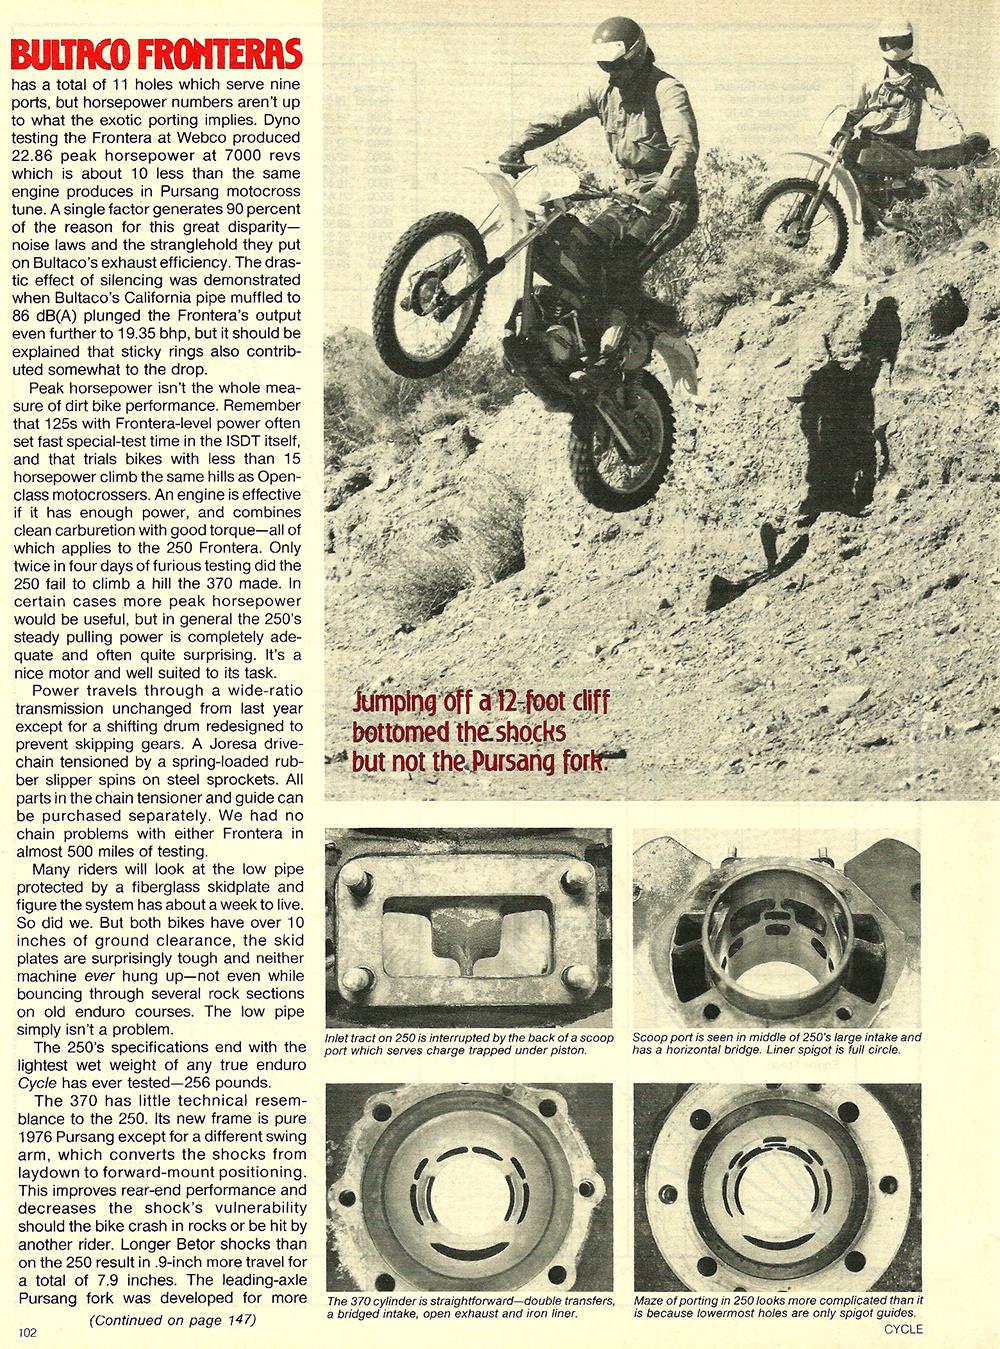 1977 Bultaco 250 and 380 Frontera road test 7.jpg